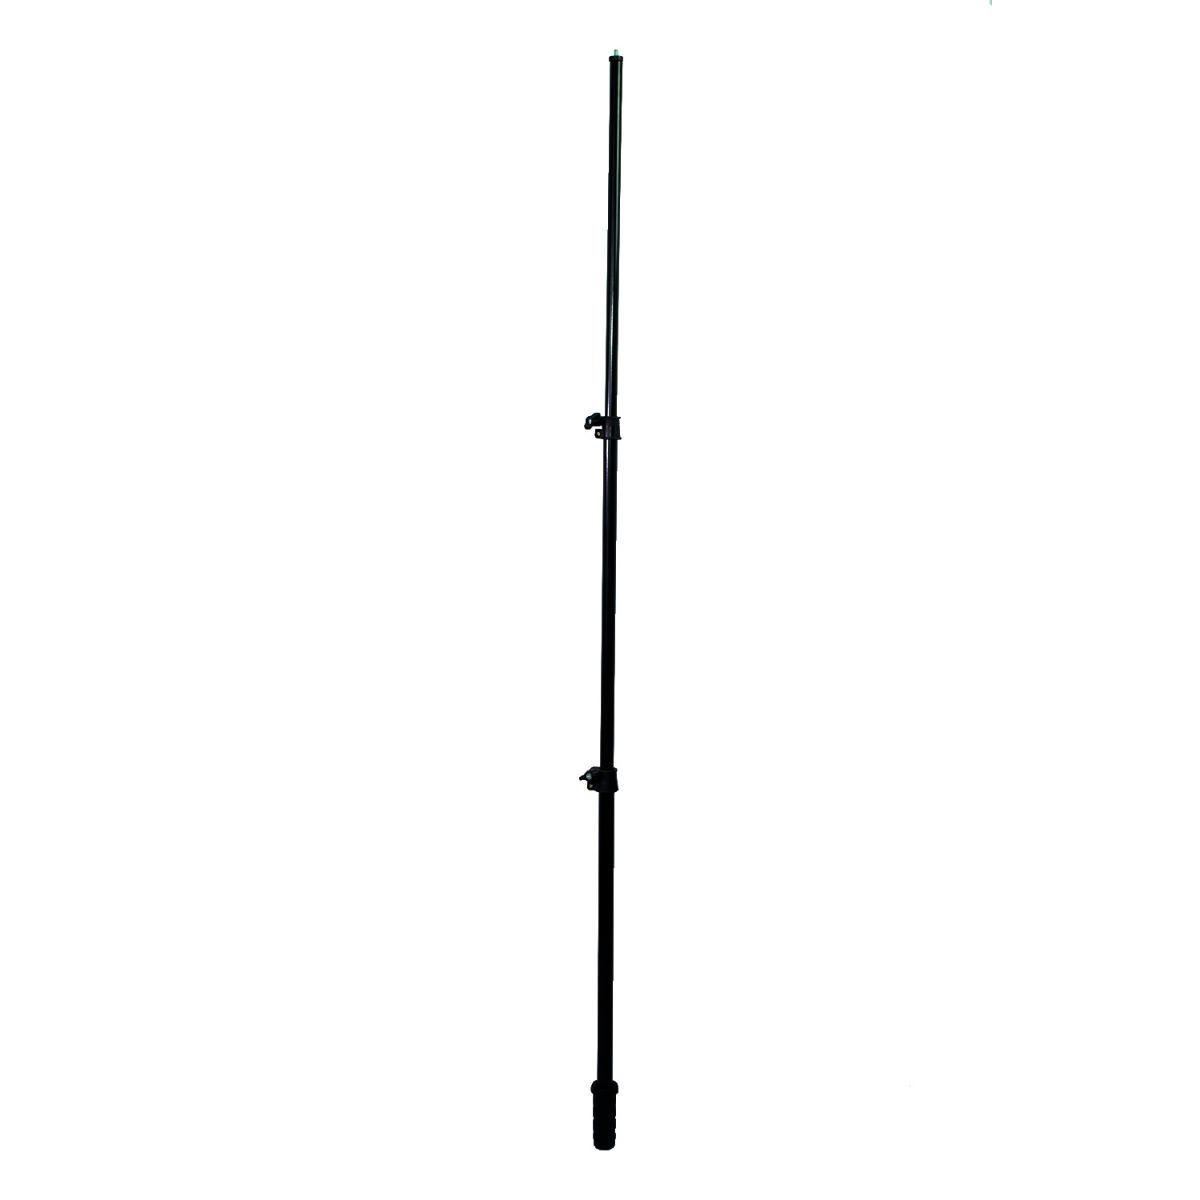 Bastão Assistente Atek 950B 171cm Vara Boom para Flash Speedlite, Câmera ou Microfone  - Fotolux